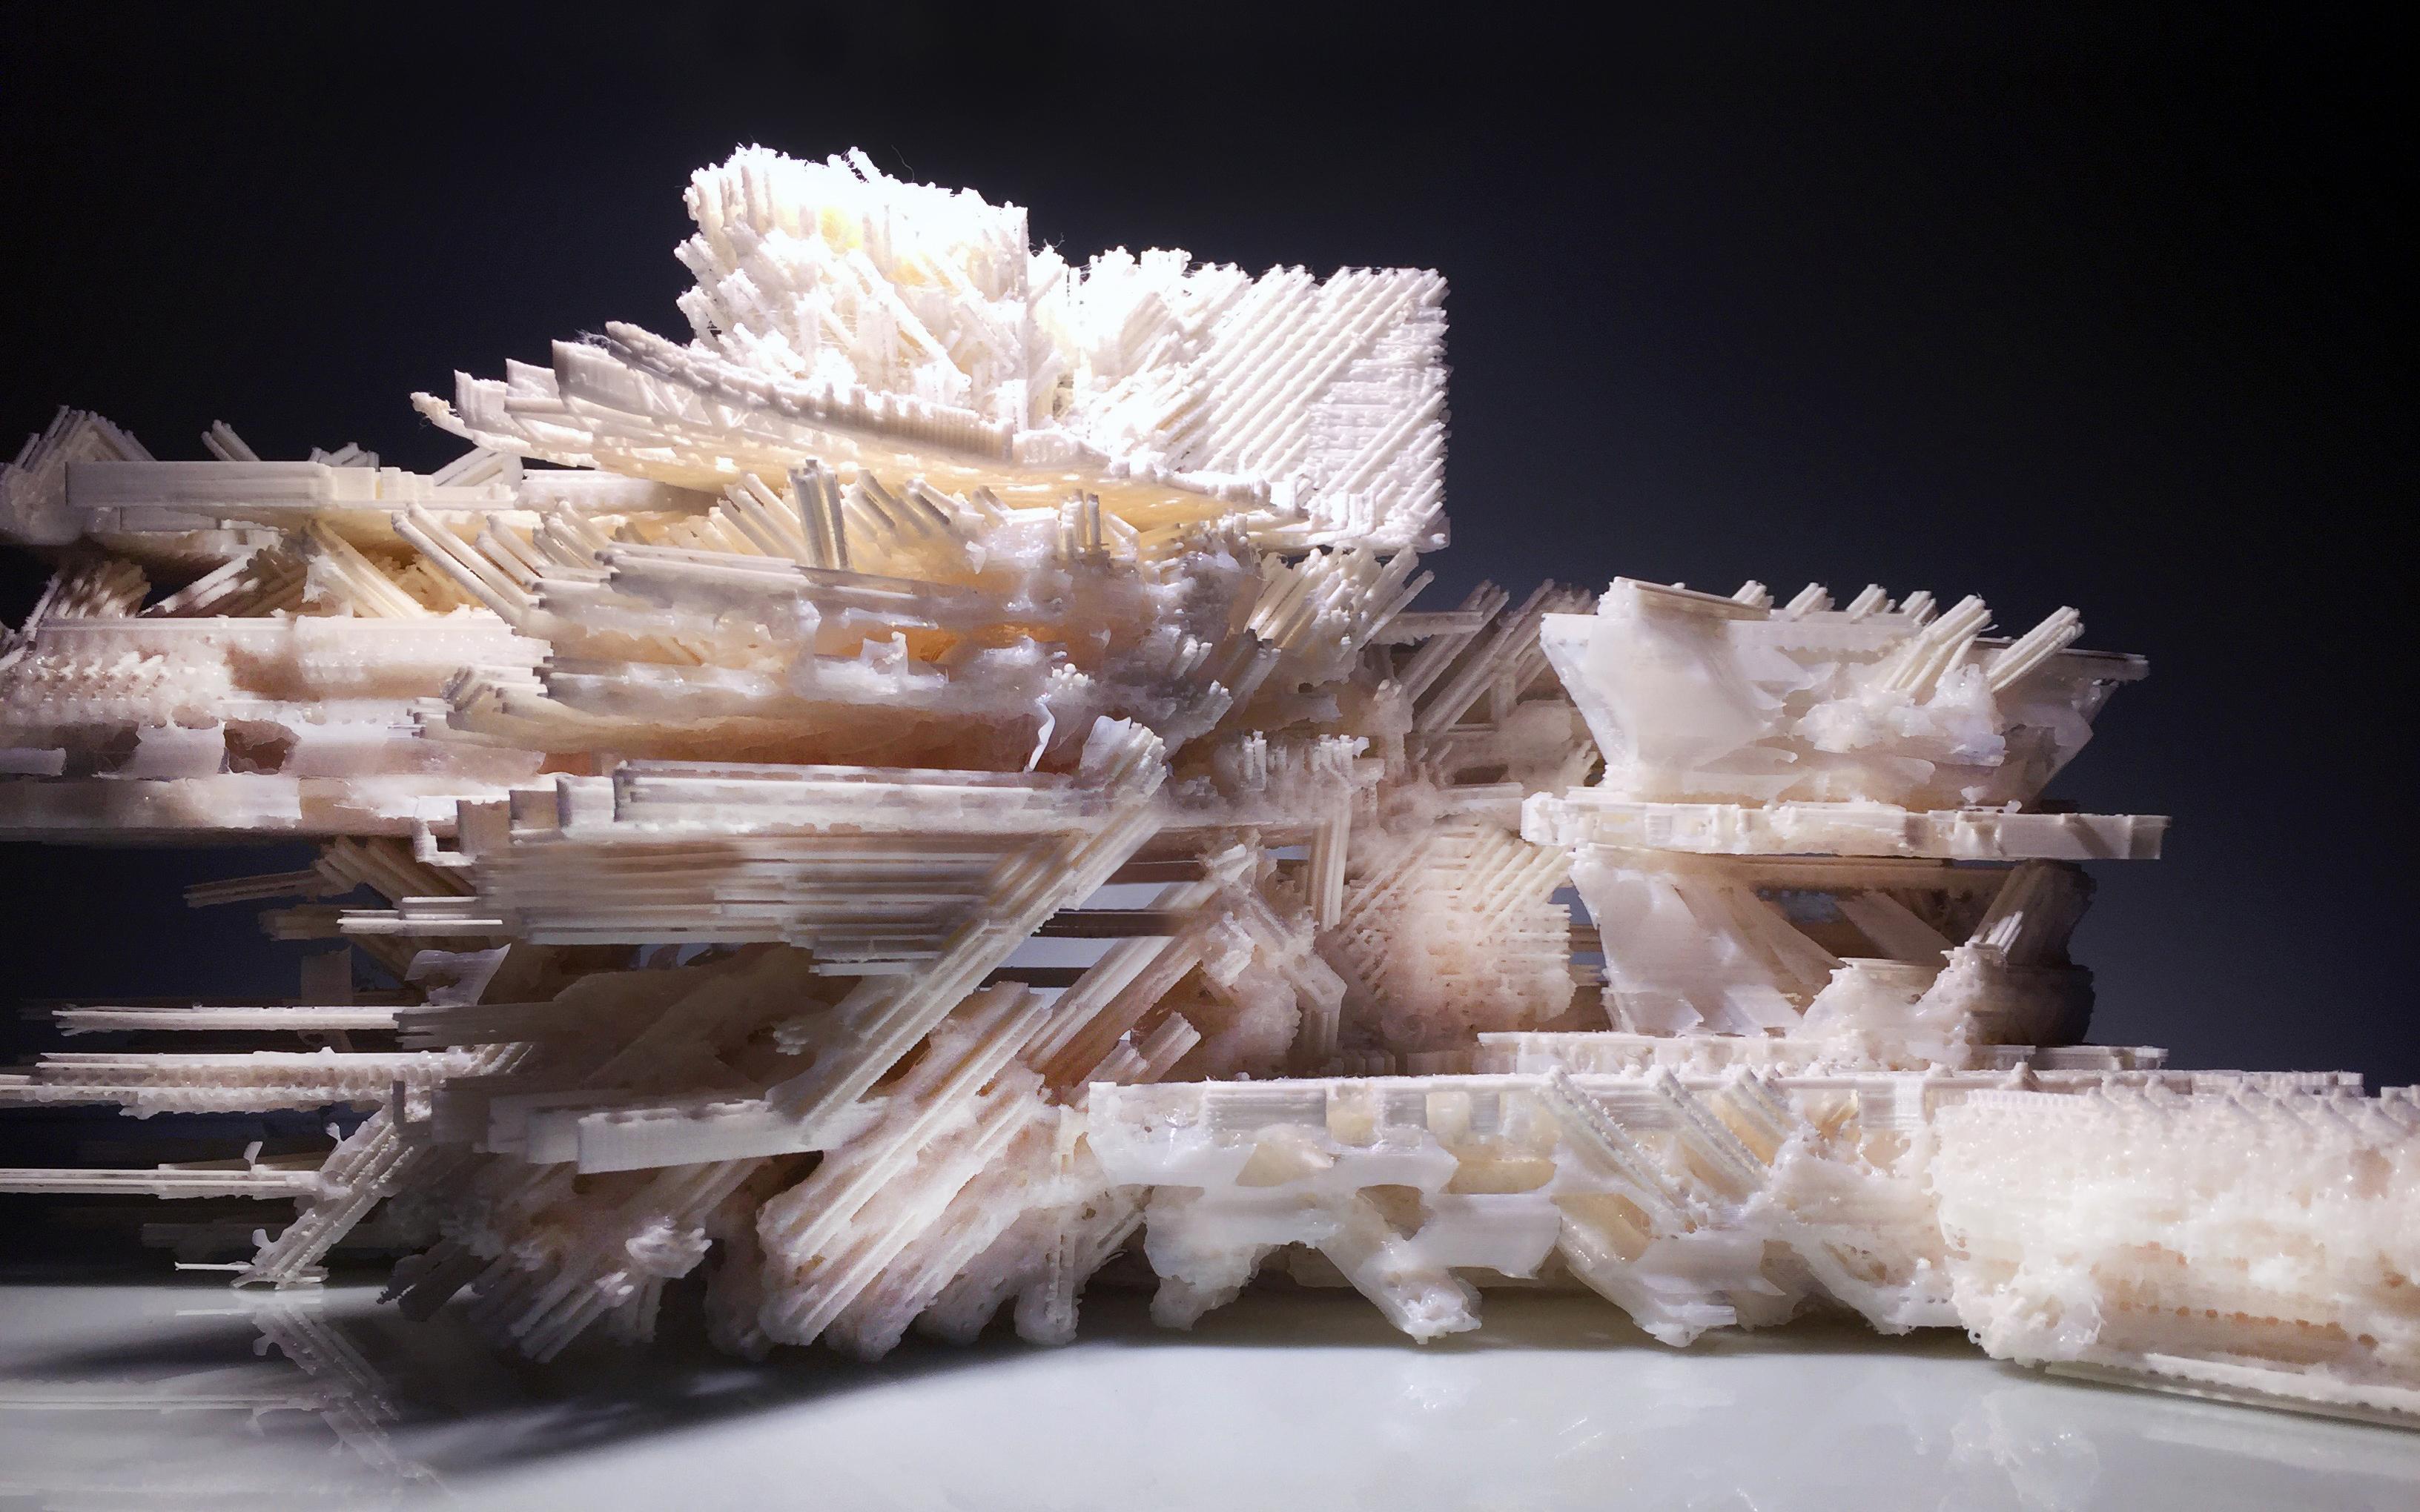 3D printed Architetcural model